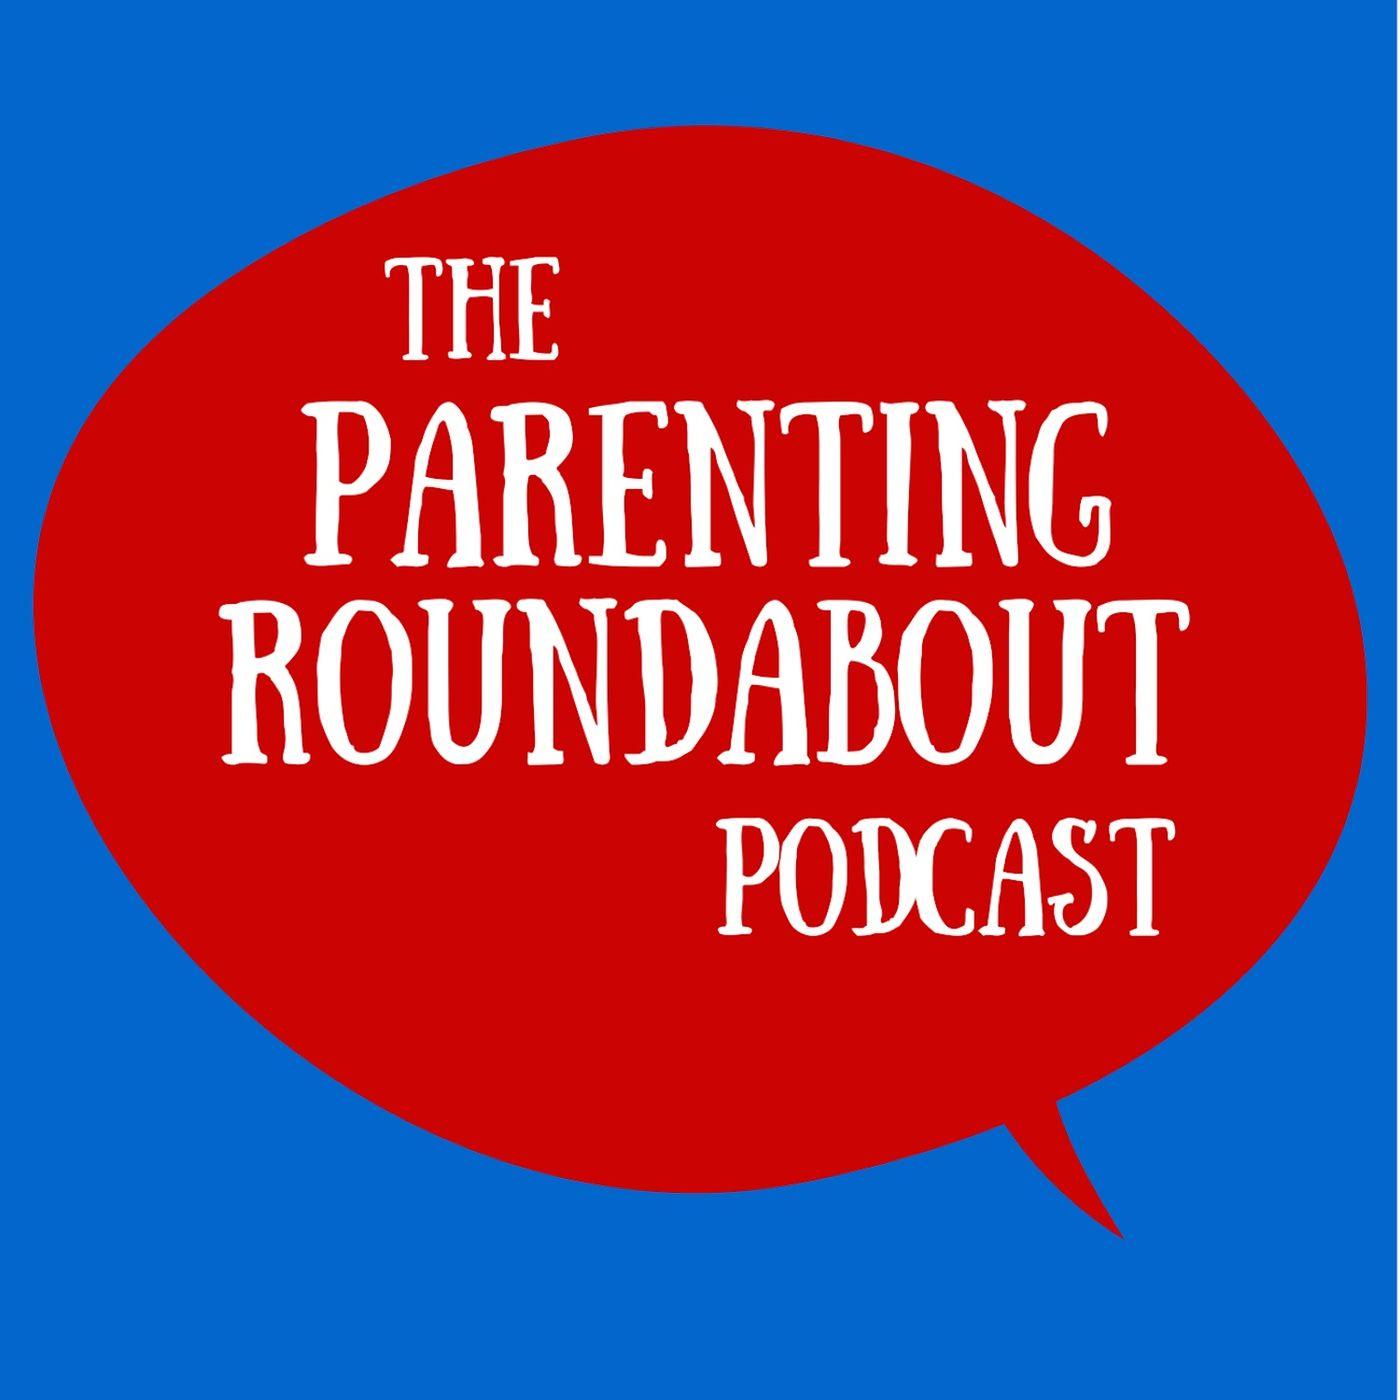 Roundabout Roundup: Rome Cavalieri Hotel, Money Heist, and a Productive Playlist